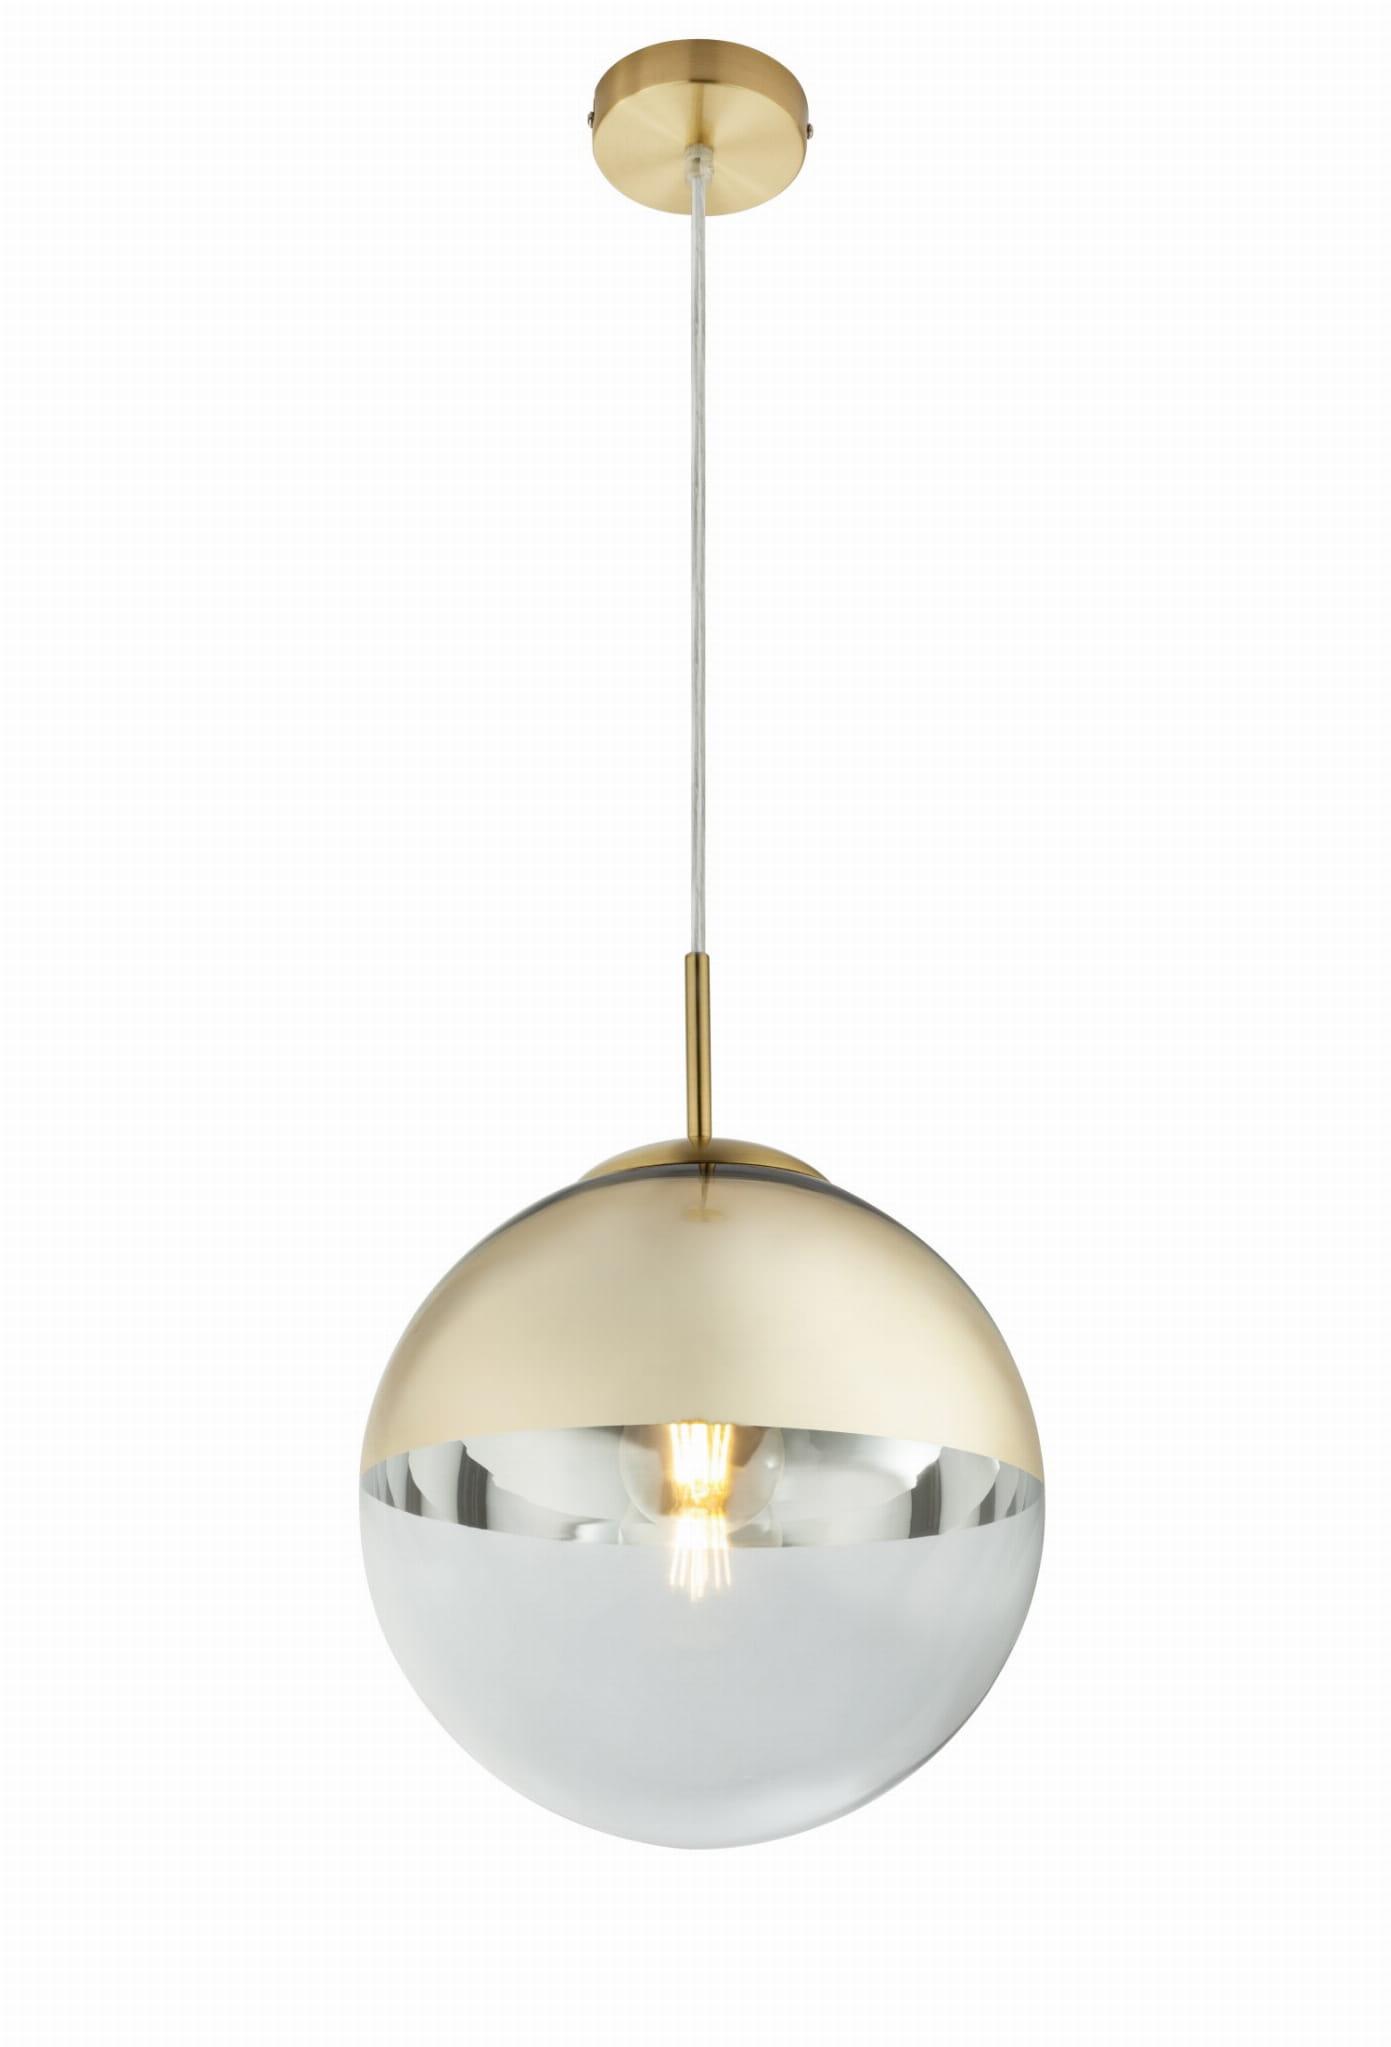 Globo Nowoczesna Lampa Wiszaca Kula Varus 15856 Gold Lagunalight E Shop